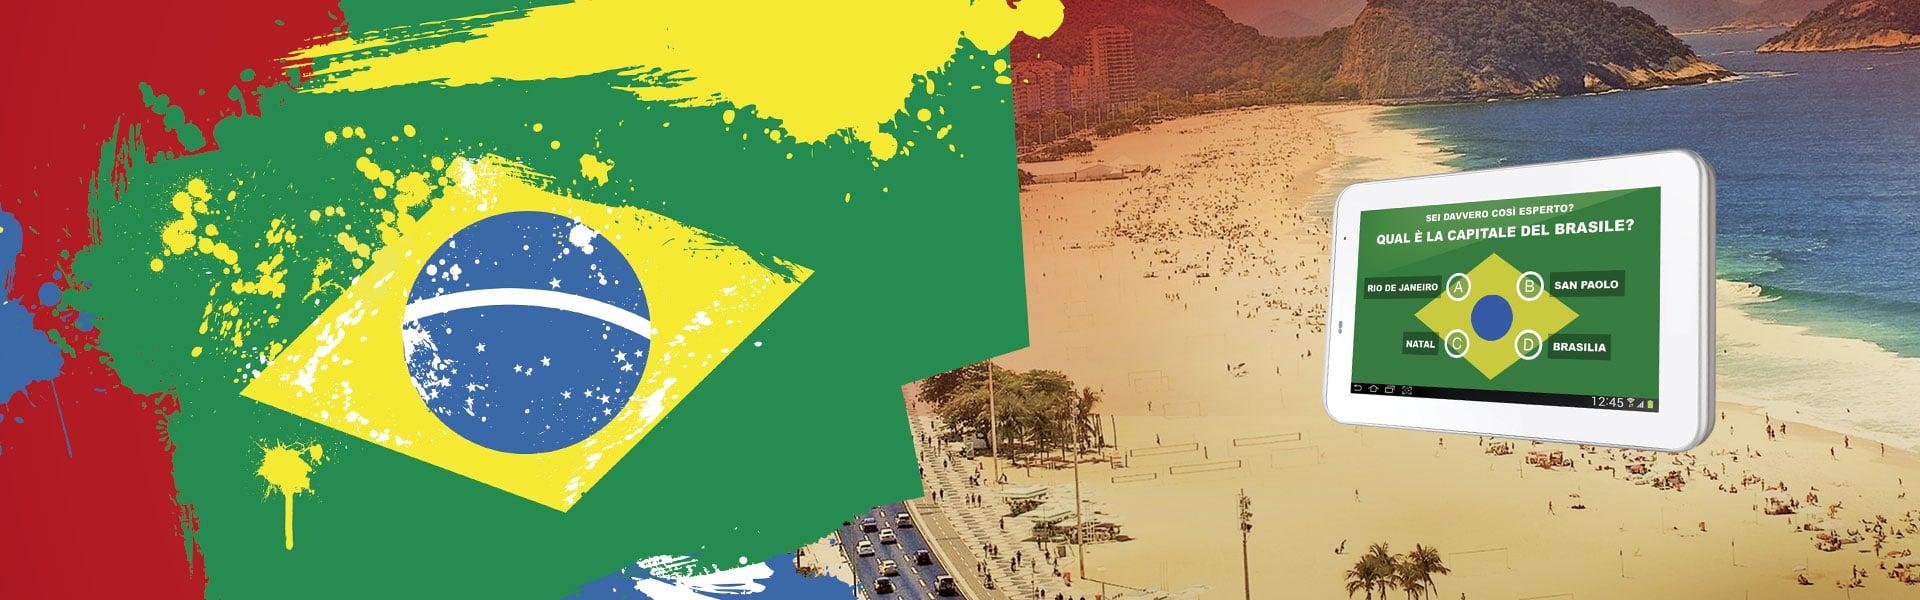 Peroni - Passione Brasile 1